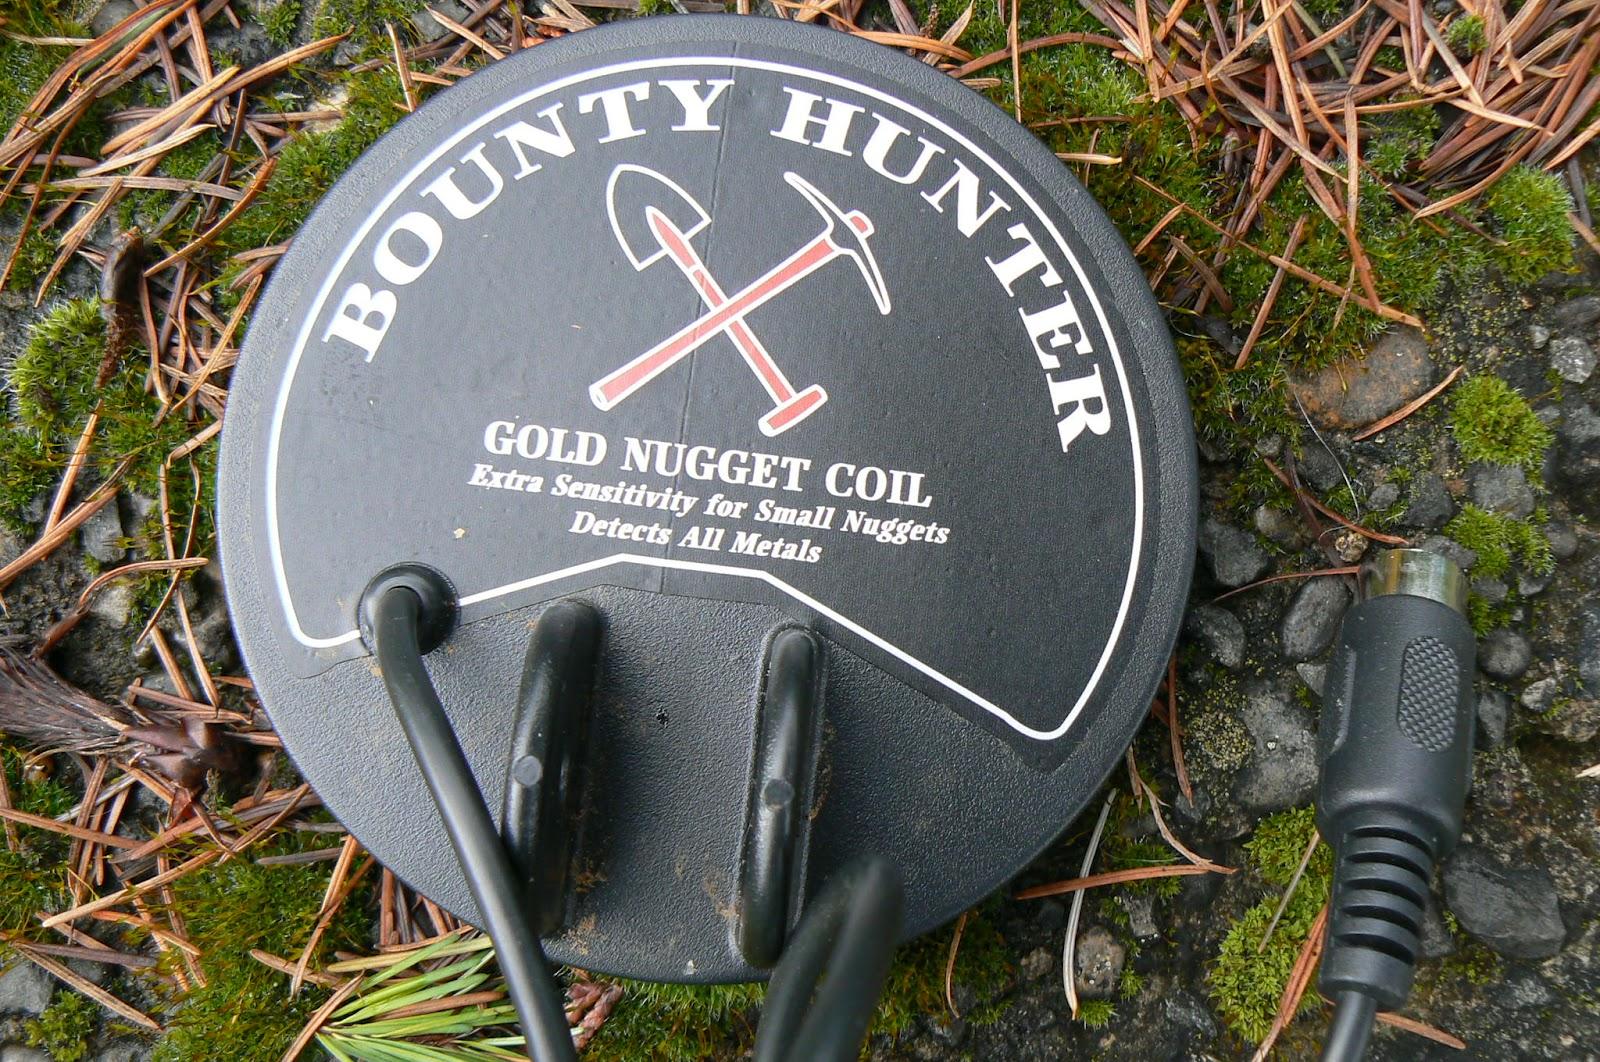 bounty hunter prospector metal detector manual